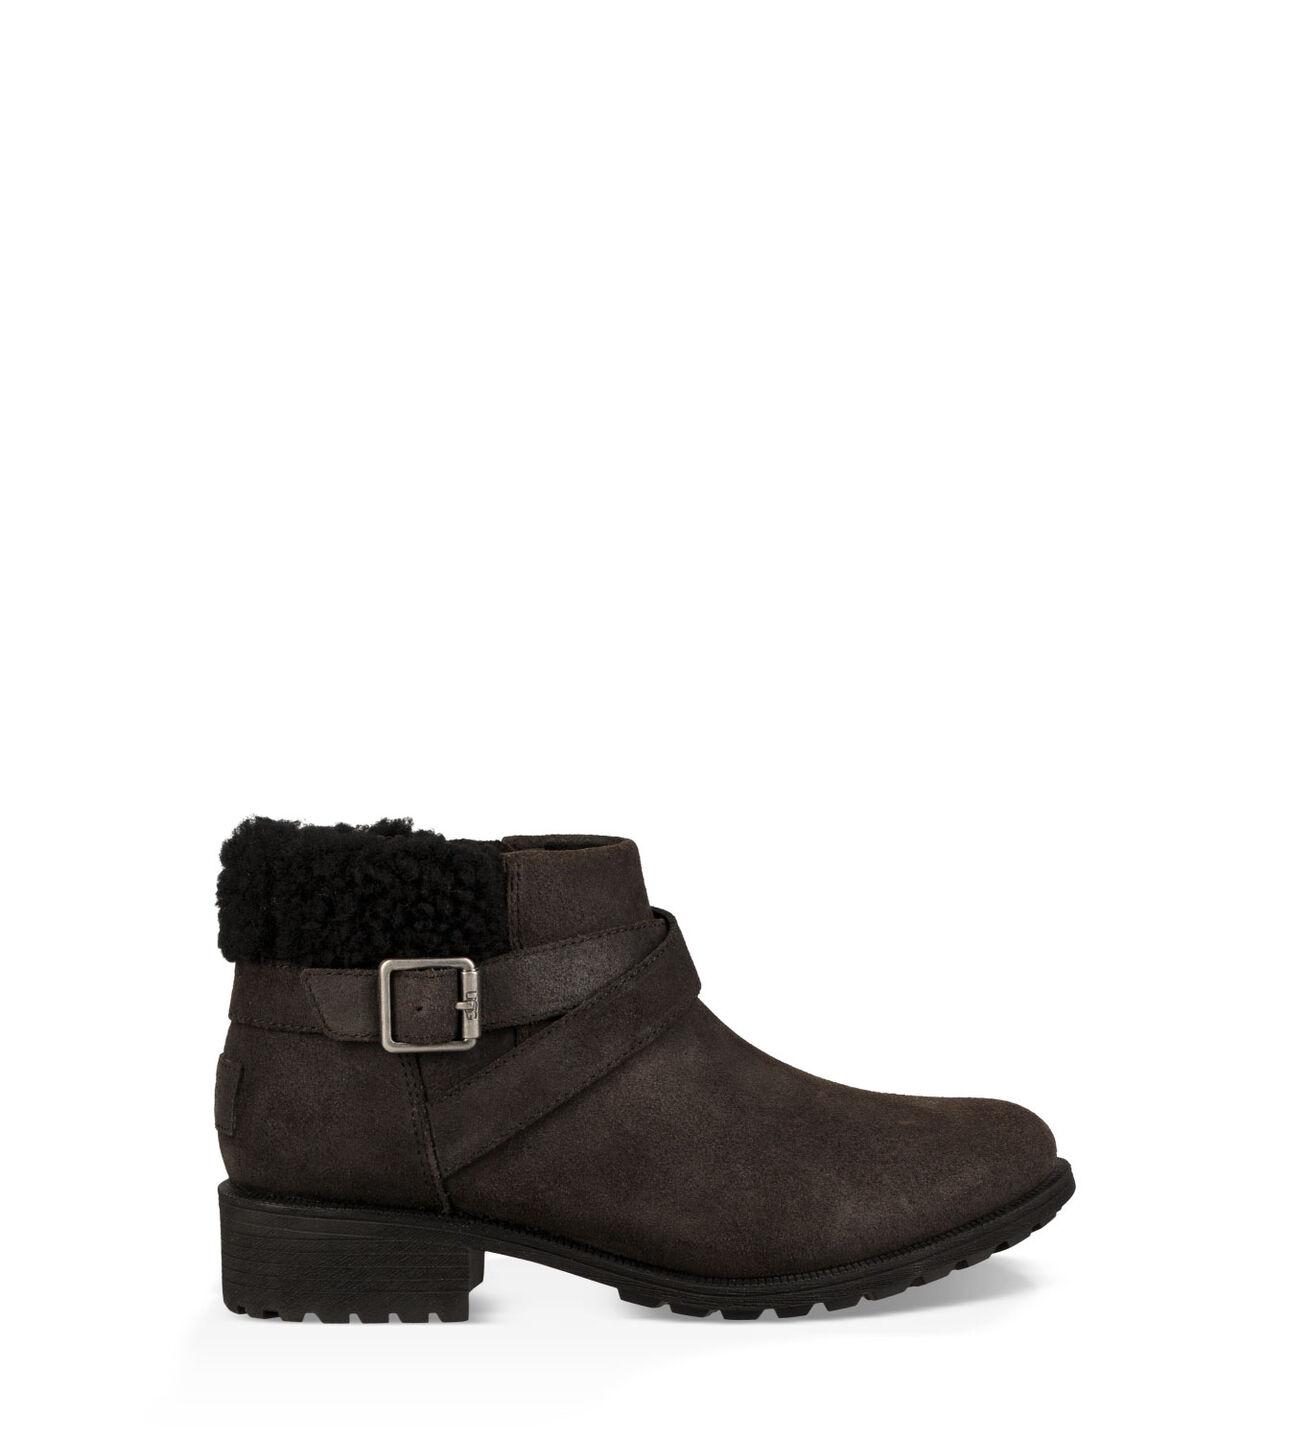 c5b7a33316c Benson Boot